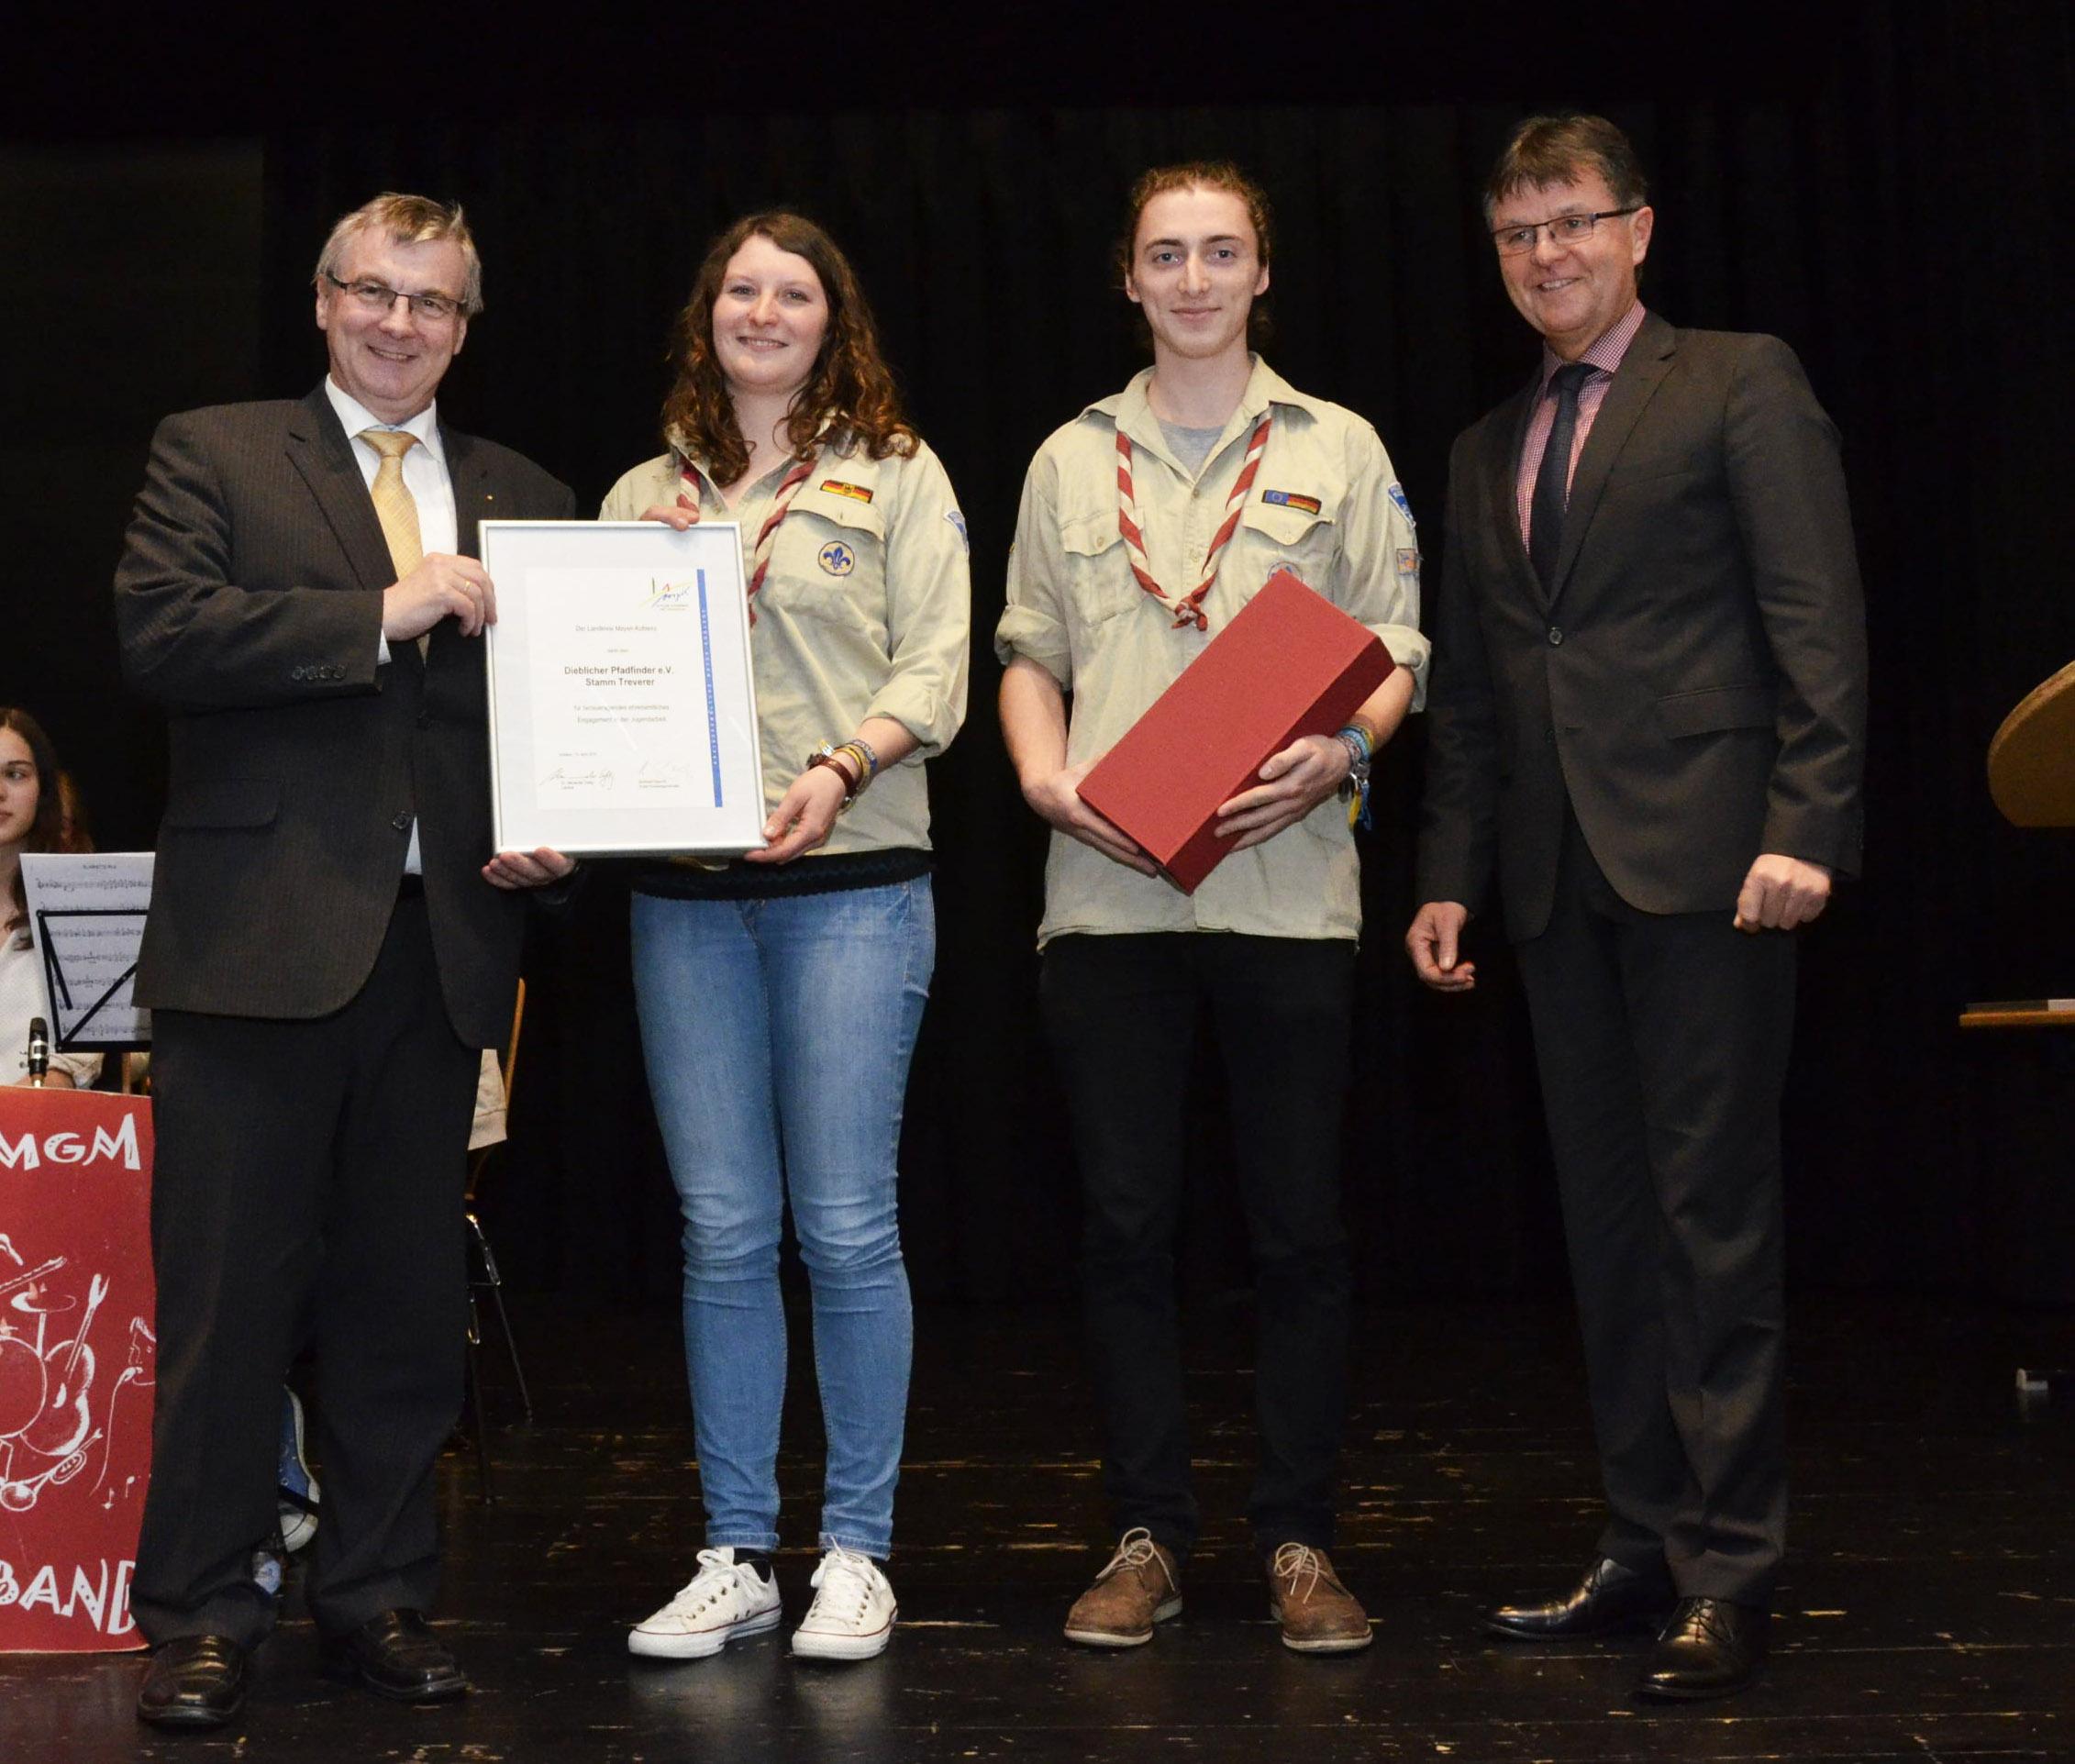 2016.04.13 Jugend und Sozialempfang KV (1)